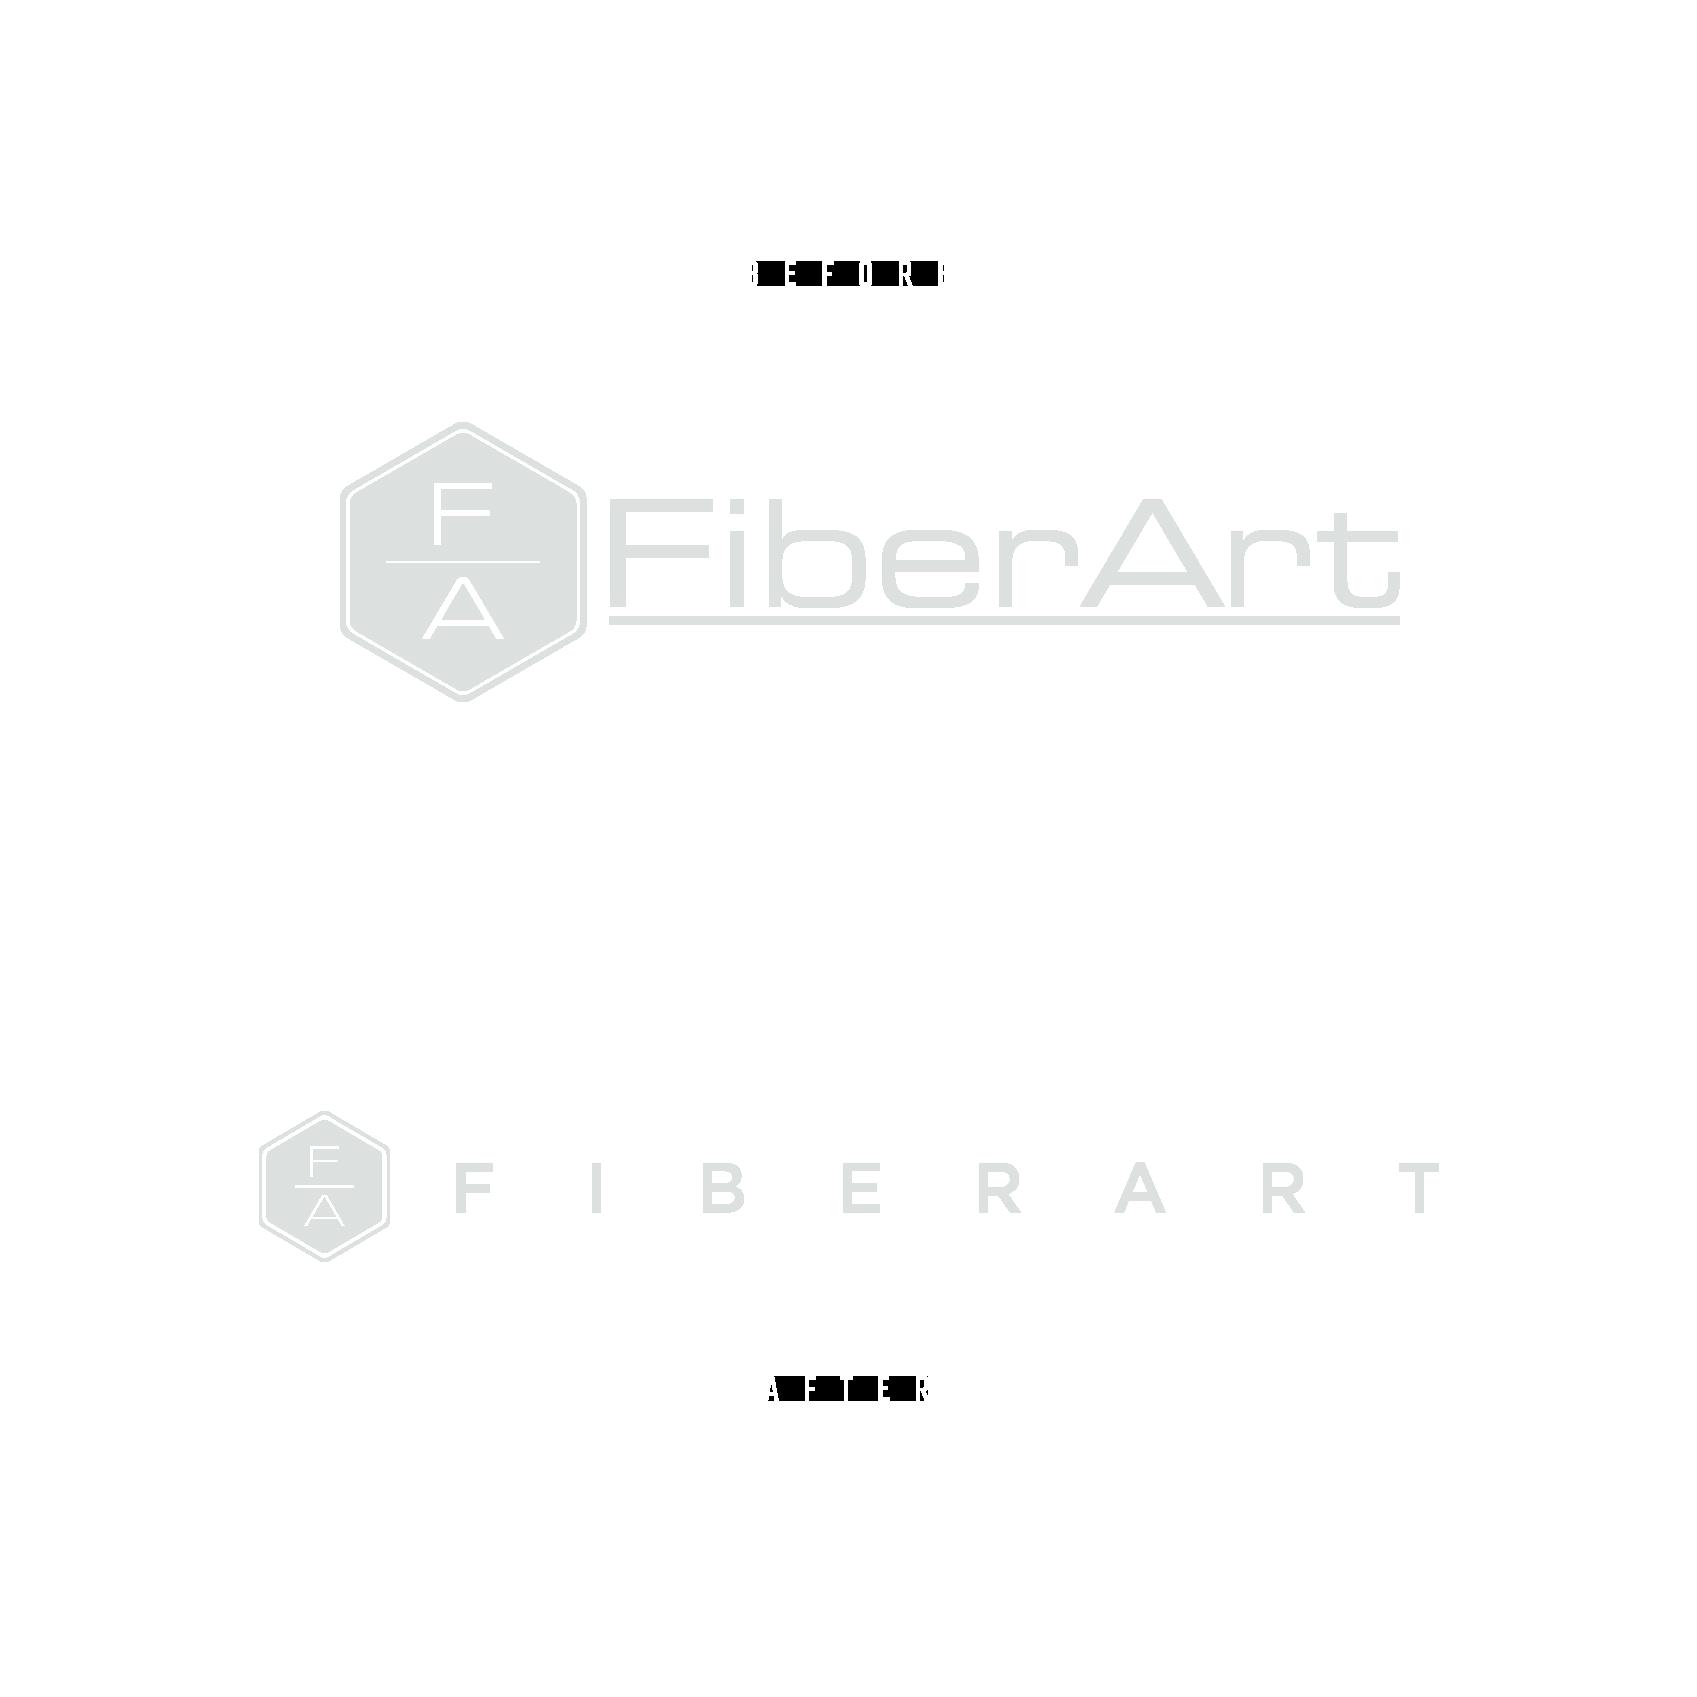 Logo Before and After - FiberArt